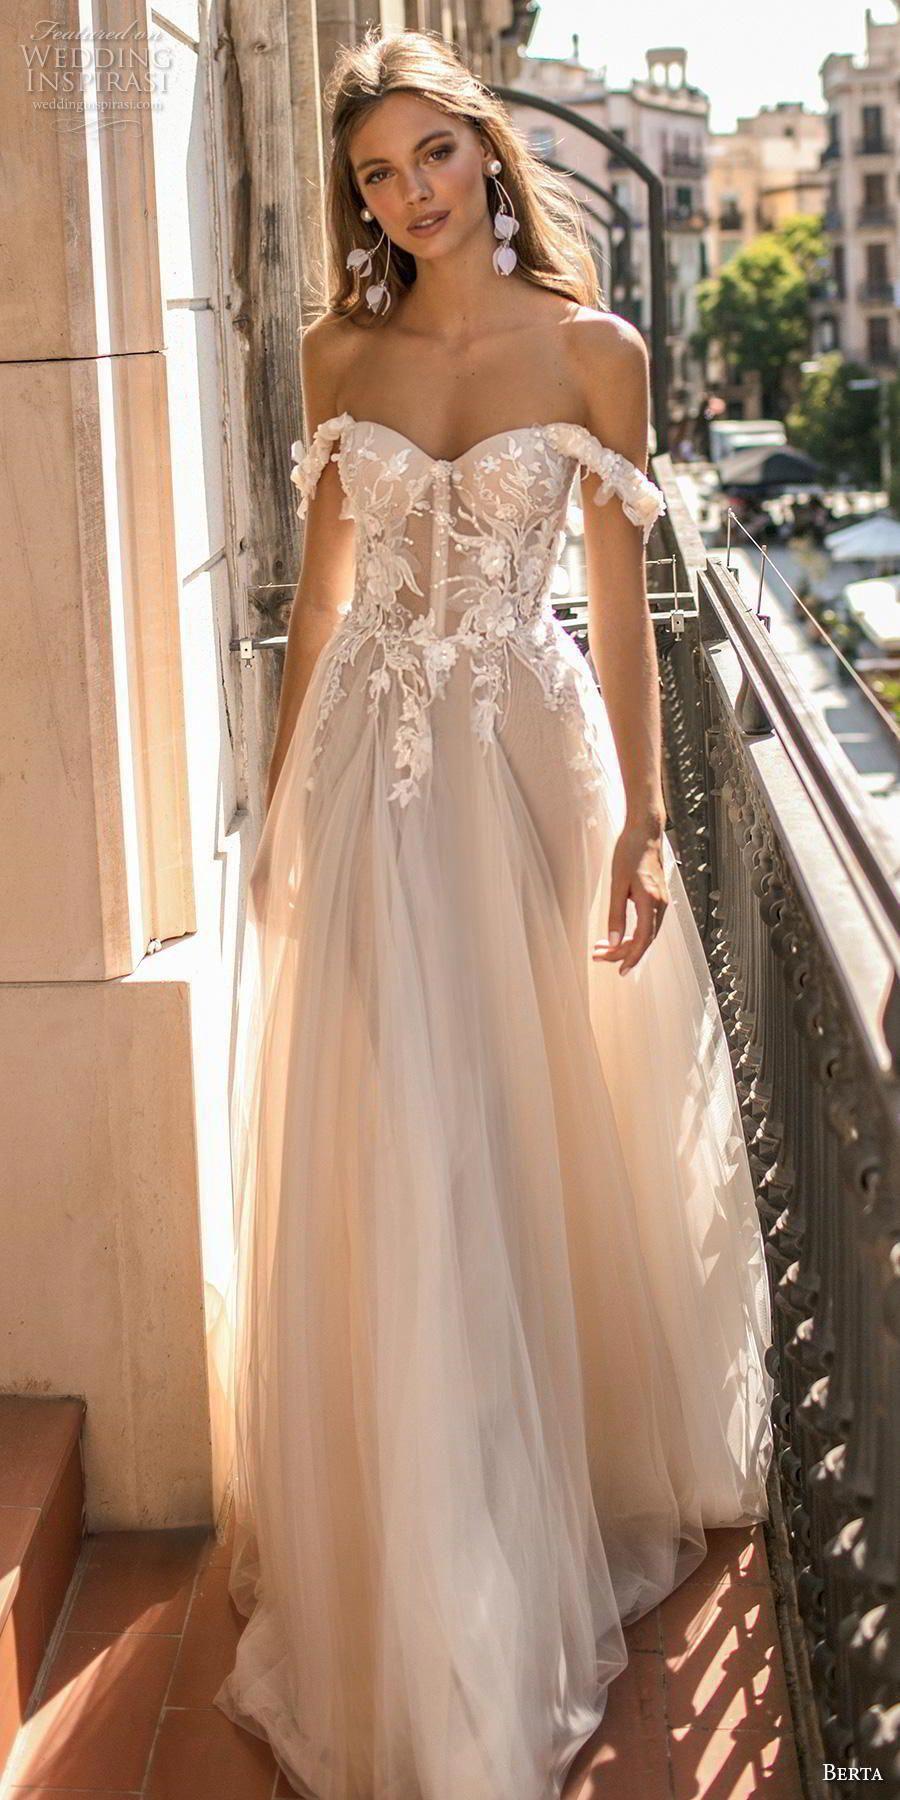 Berta Diana Bertaweddingdress Diana Is One Of The Sweetest Styles